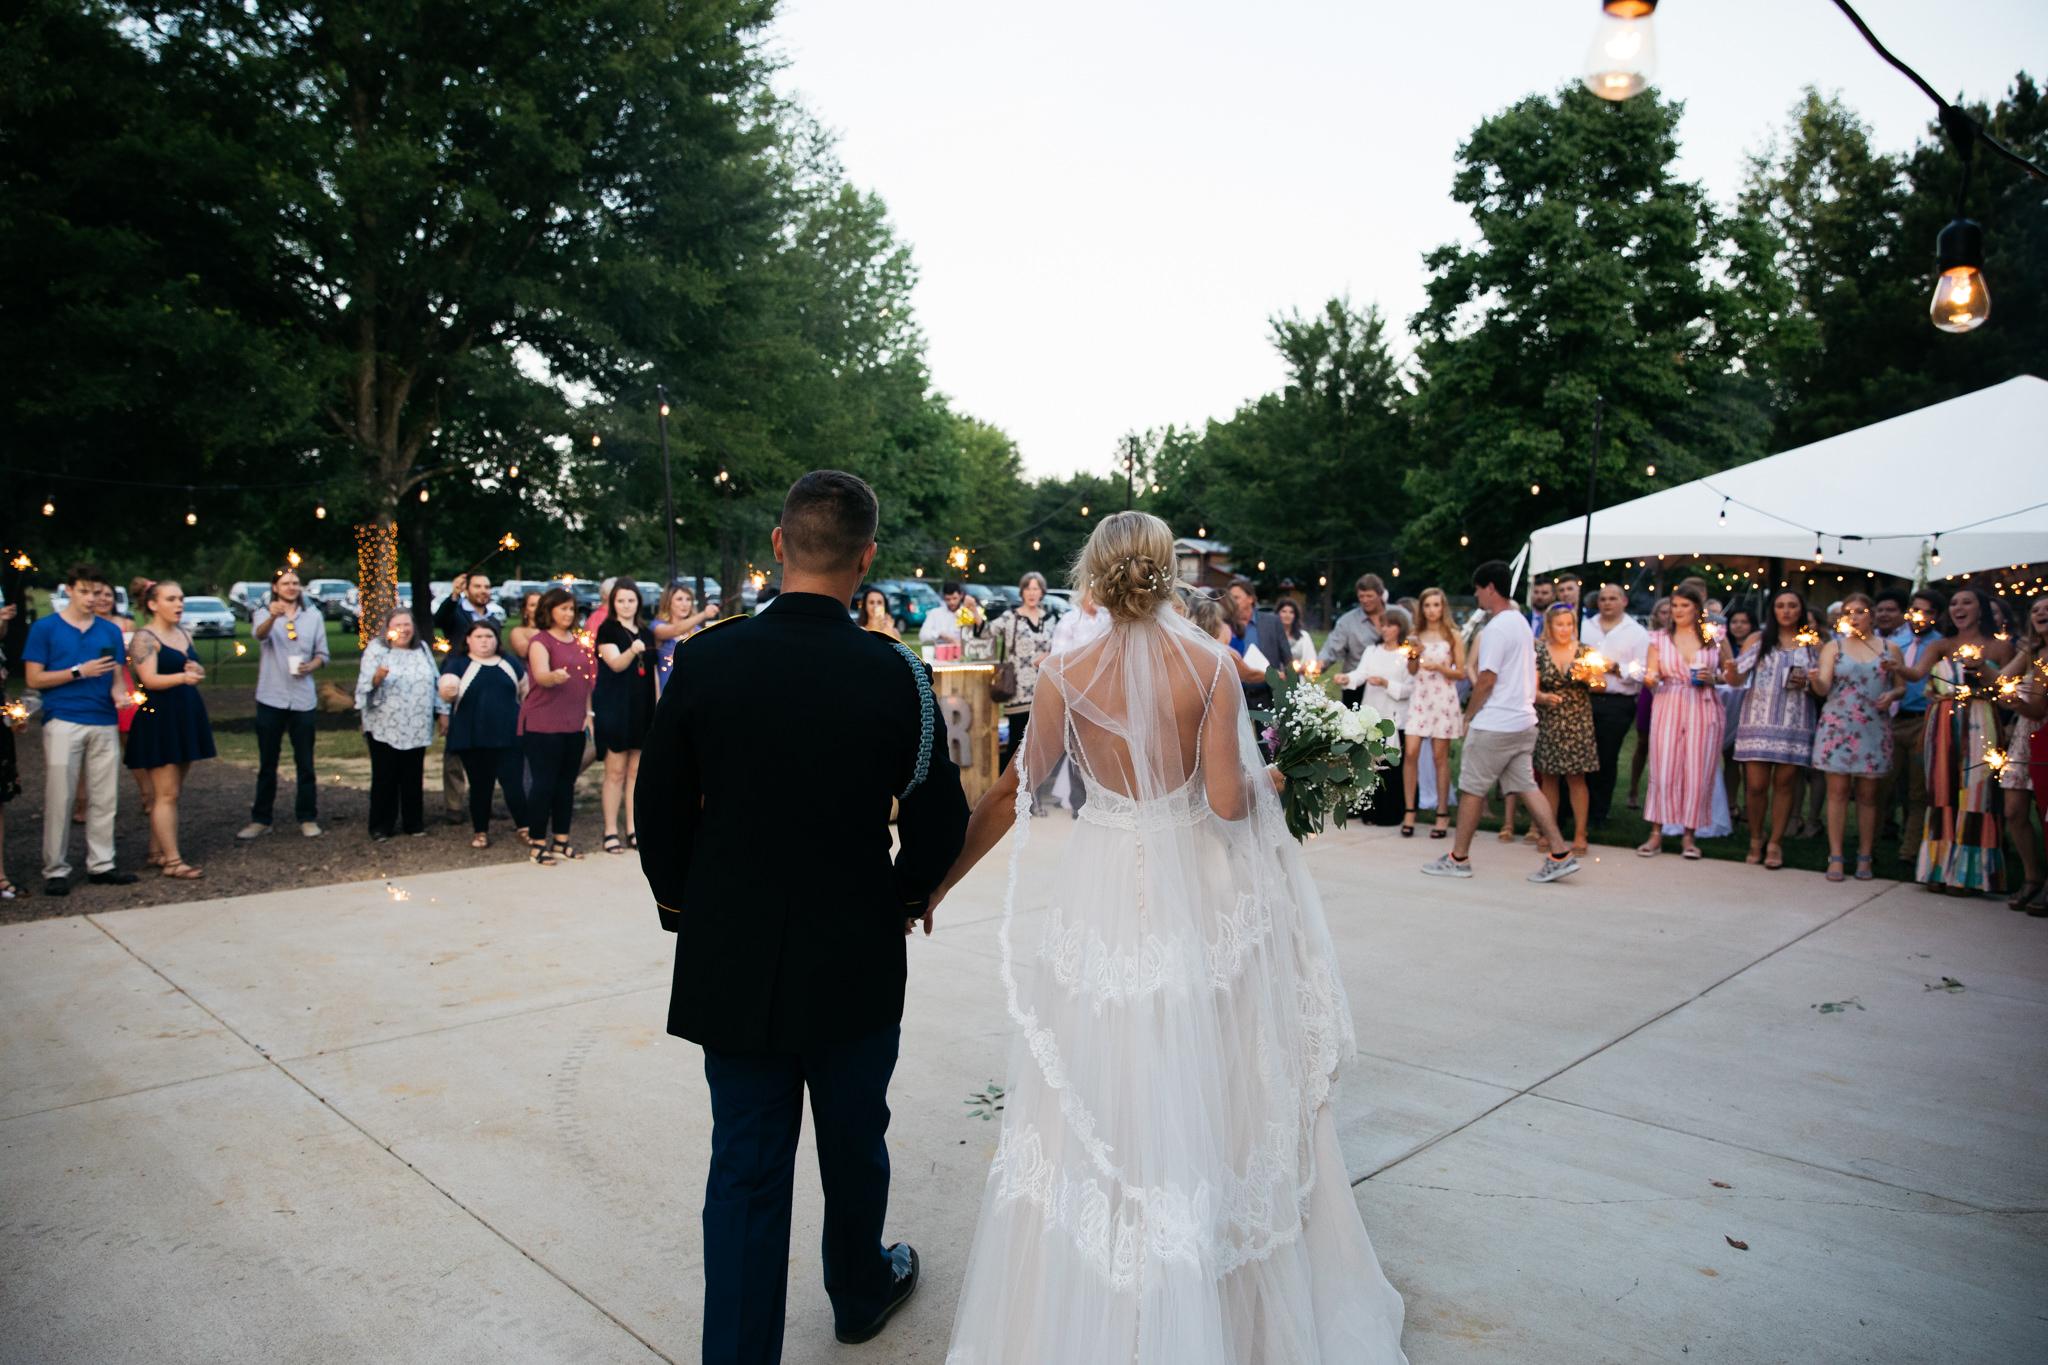 backyard-wedding-thewarmtharoundyou-lexy-branson-10.jpg